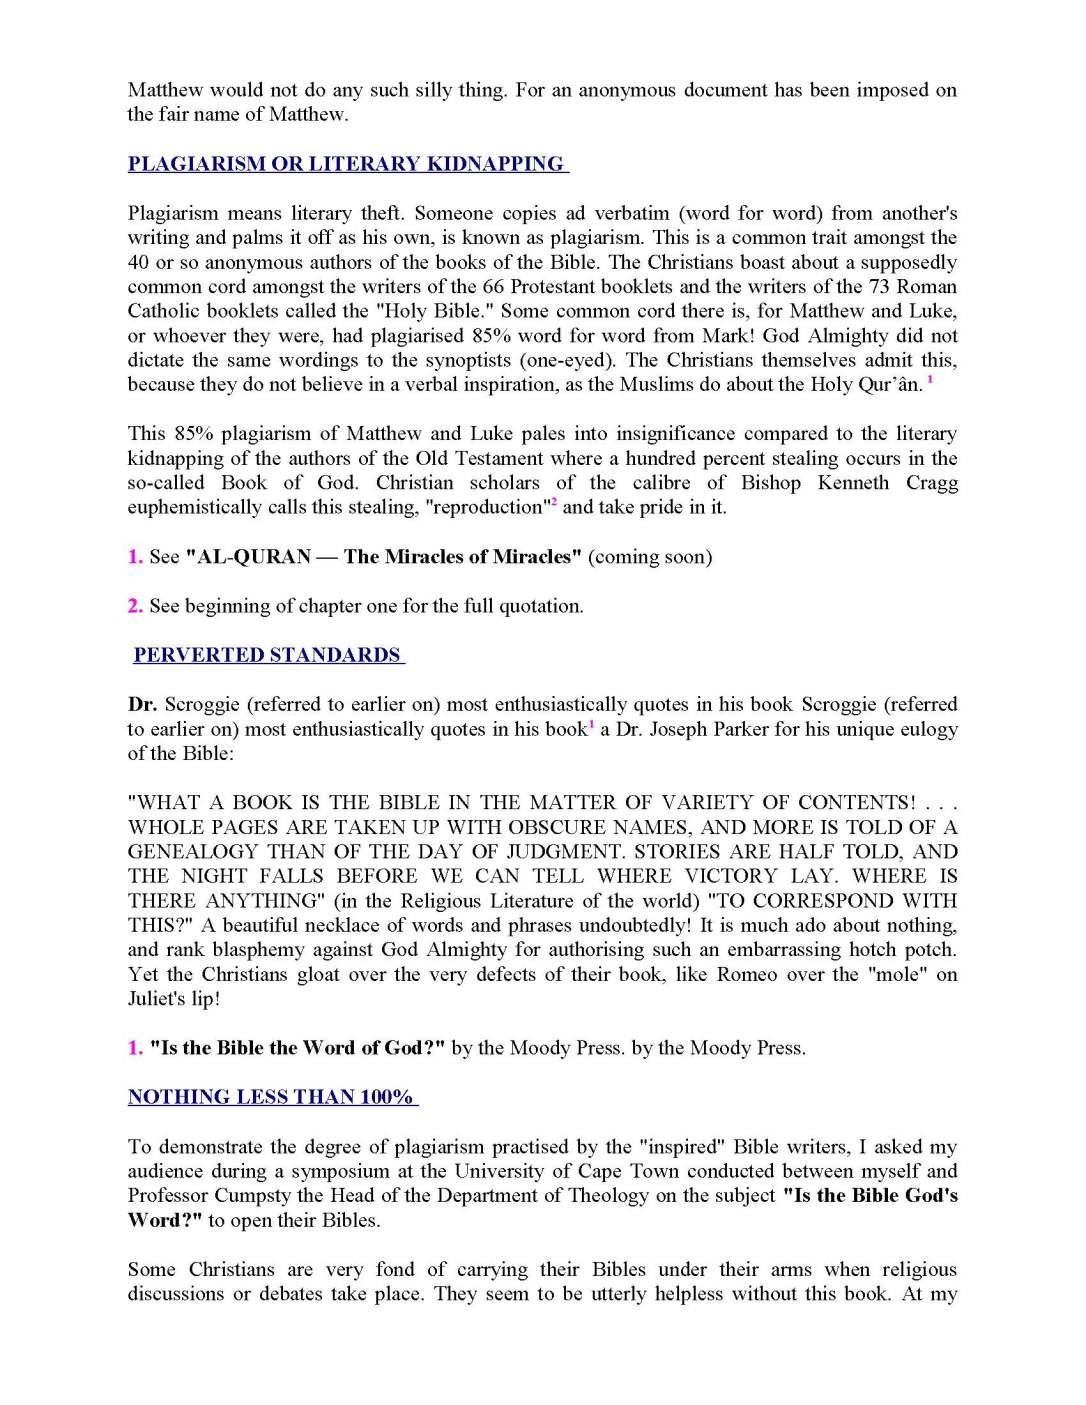 Is The Bible Gods Word [deedat]_Page_23